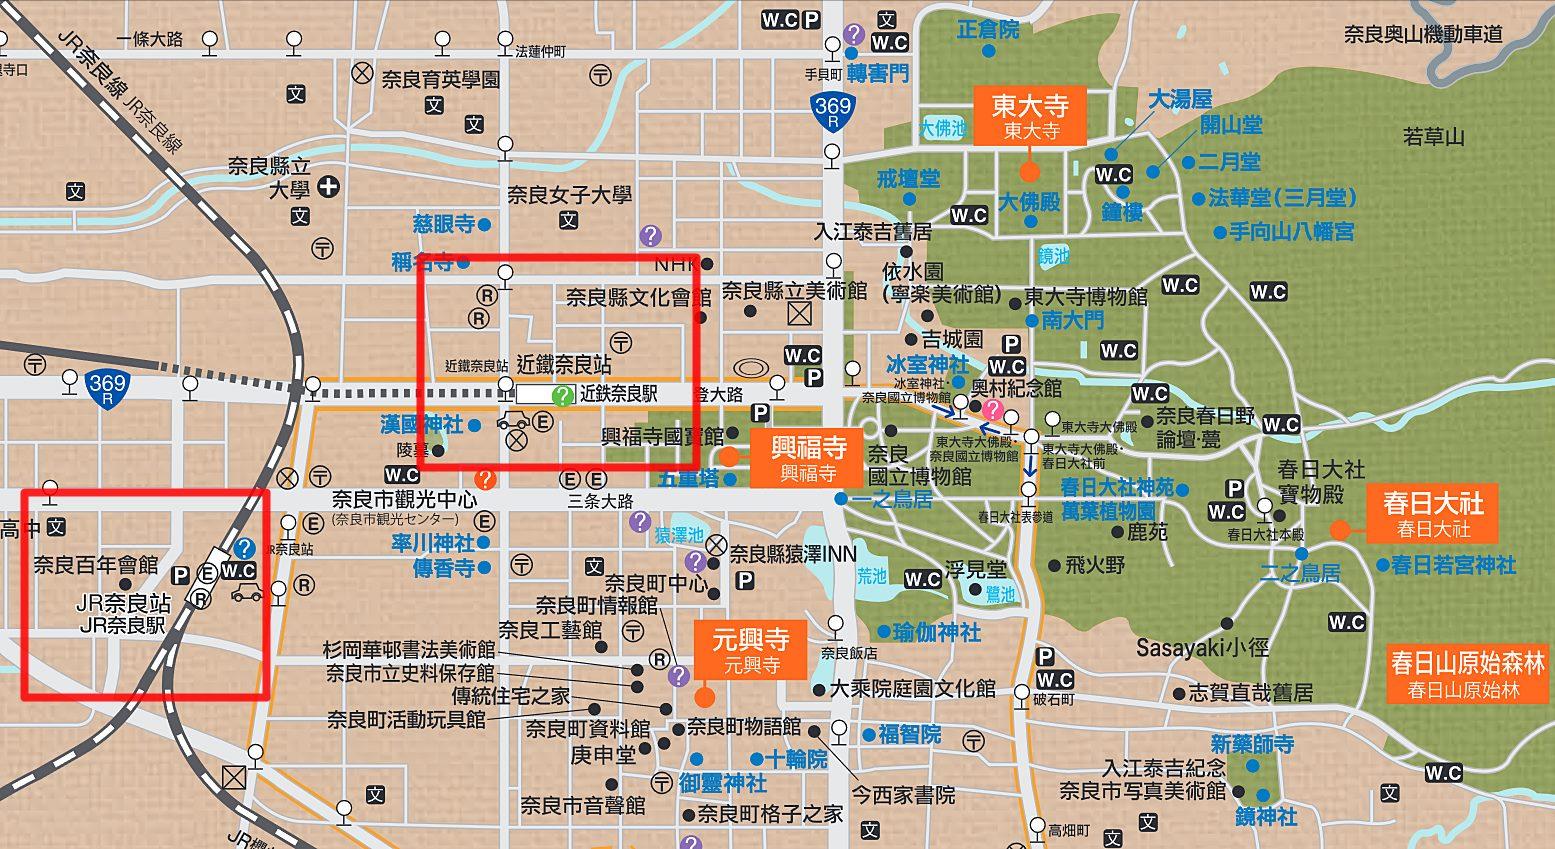 奈良-景點-推薦-市區-地圖-Map-自由行-旅遊-觀光-日本-Nara-Tourist-Attraction